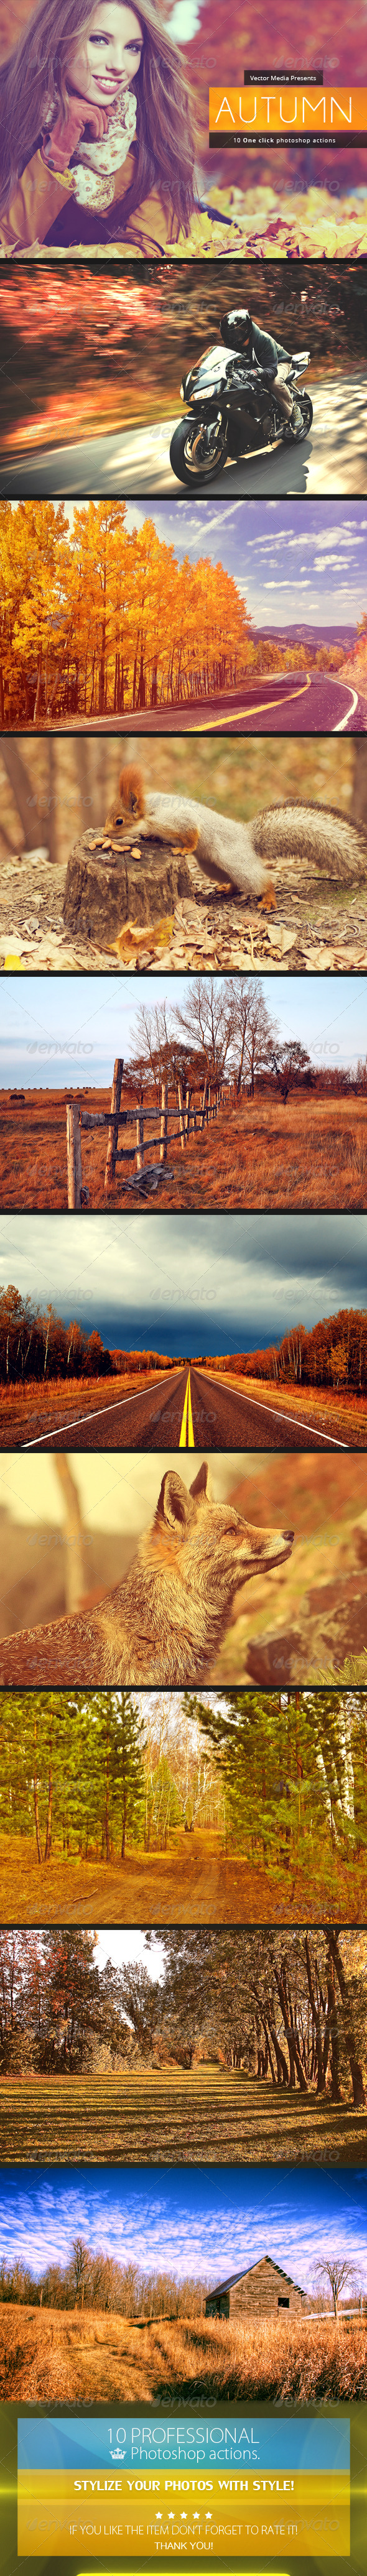 GraphicRiver Autumn Photoshop Actions 6037561